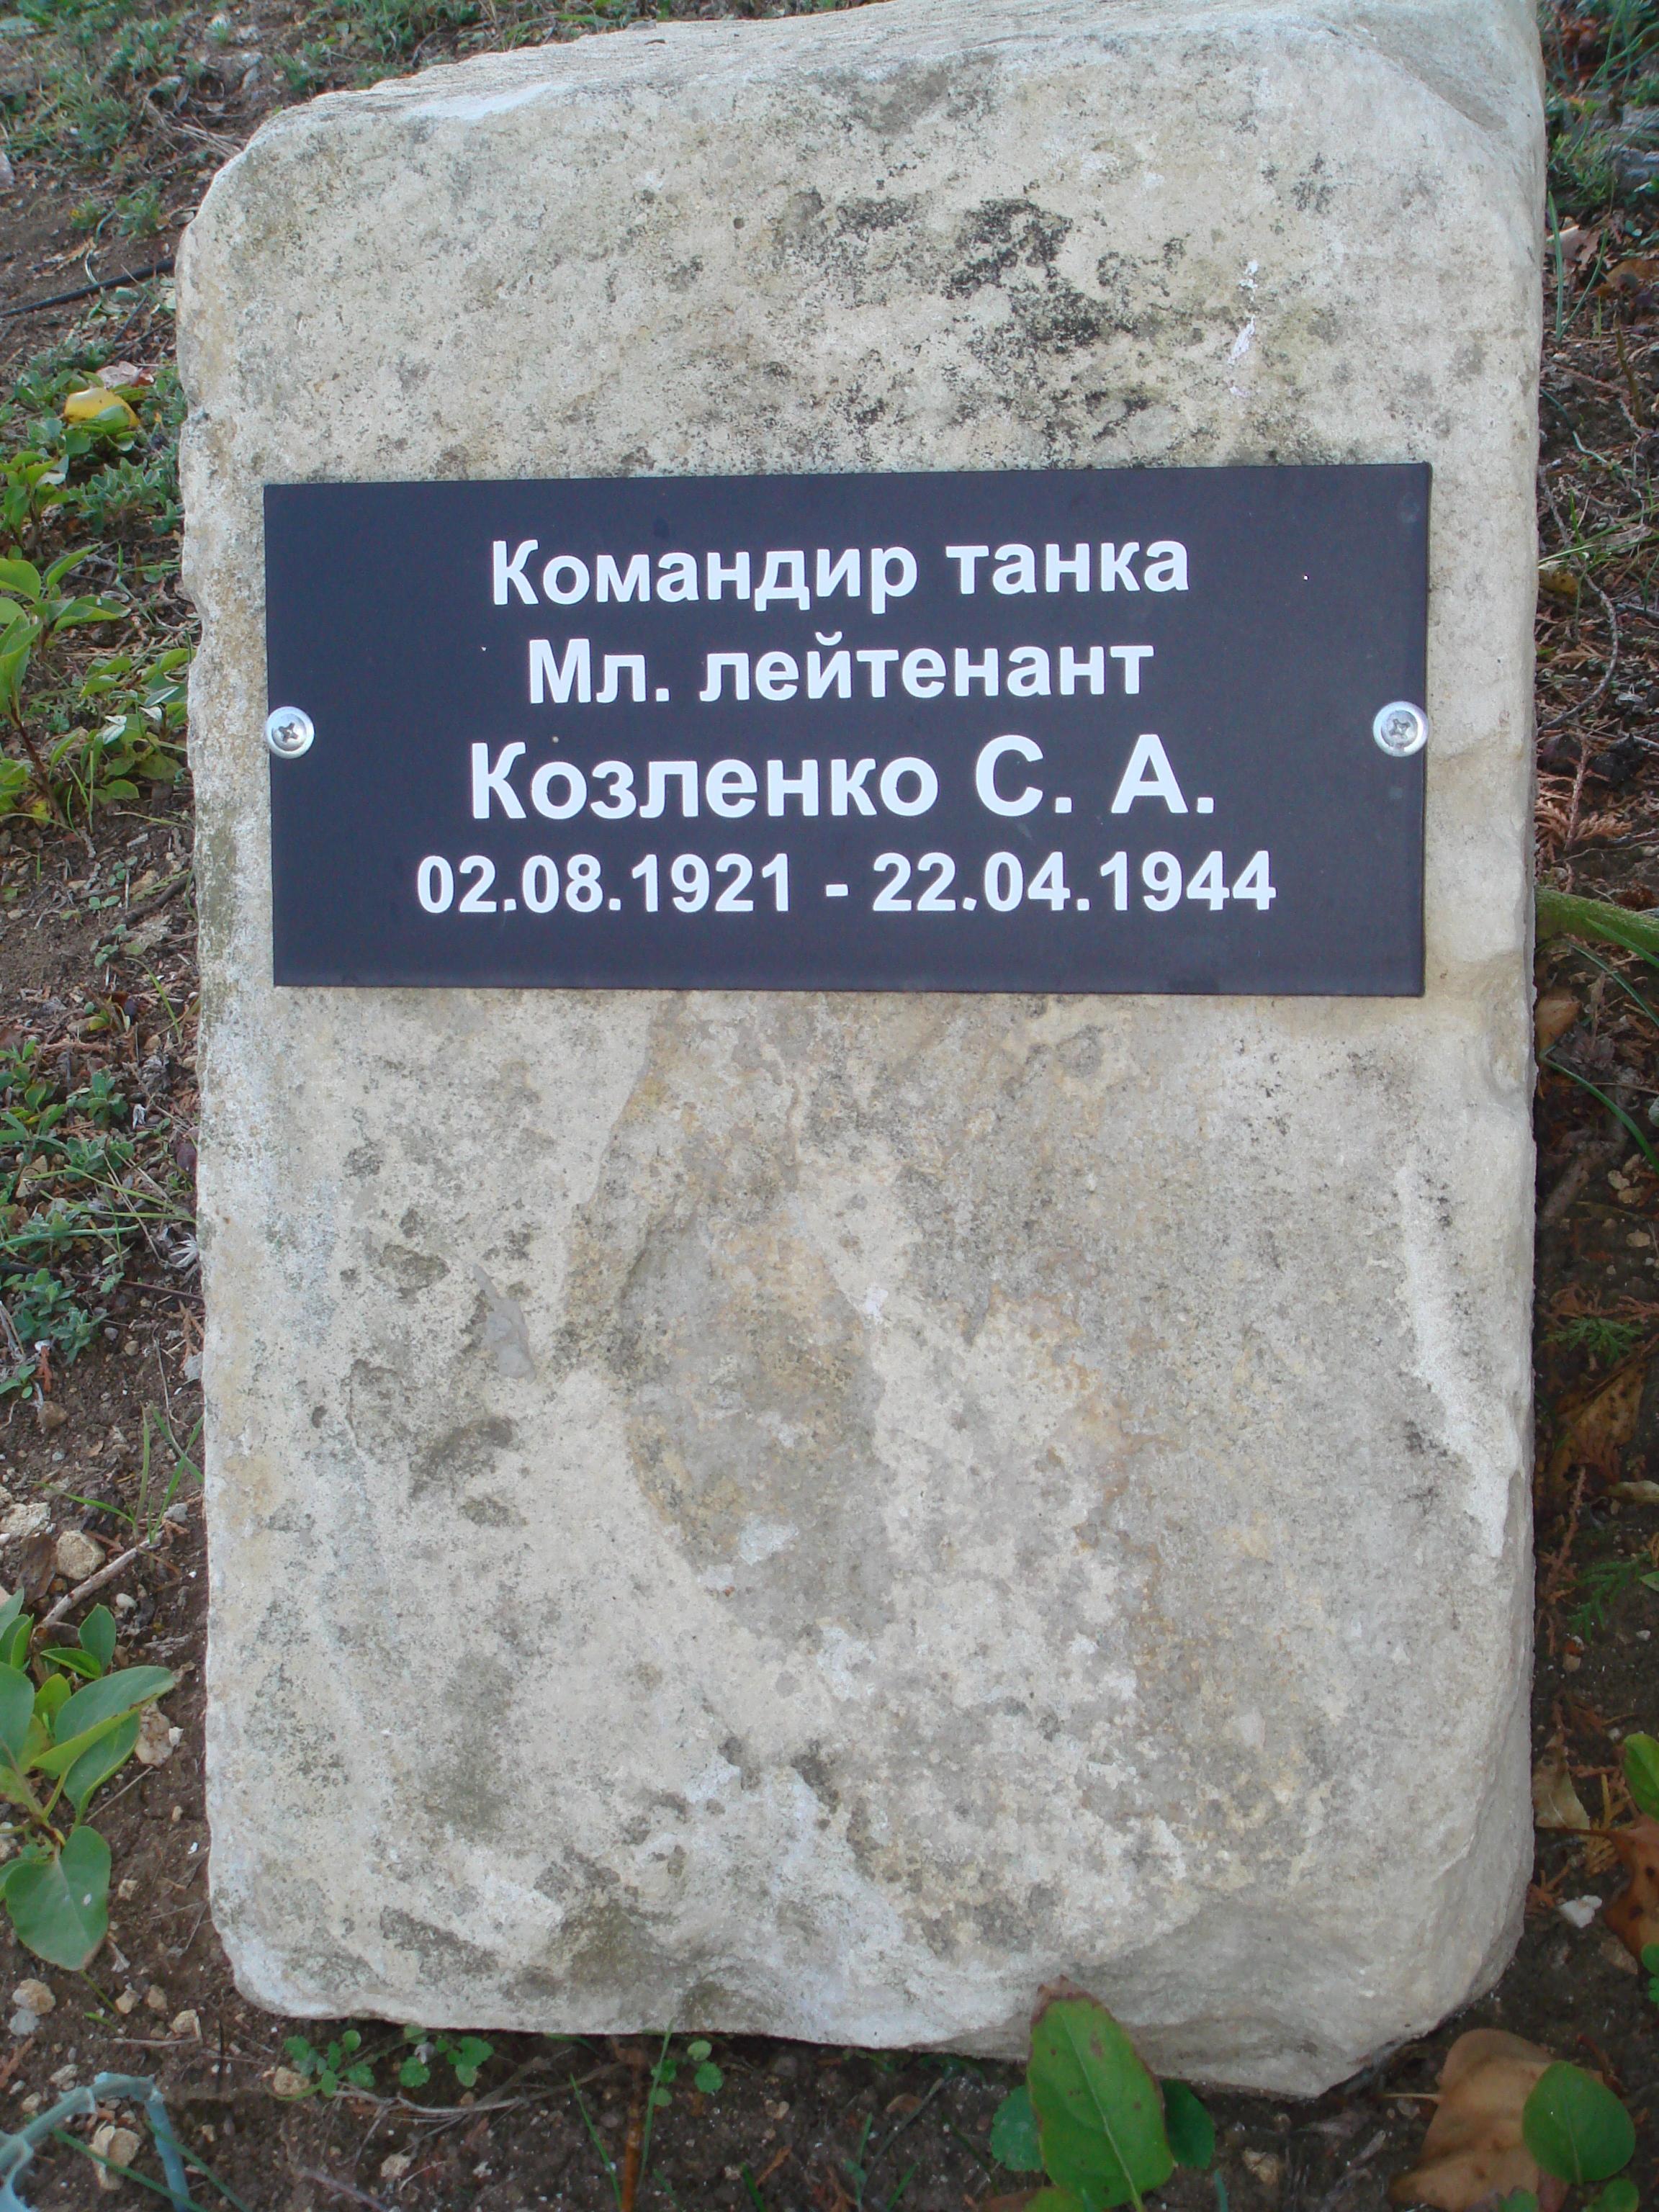 К-р танка, мл. лейтенант Козленко С.А. 1921-1944